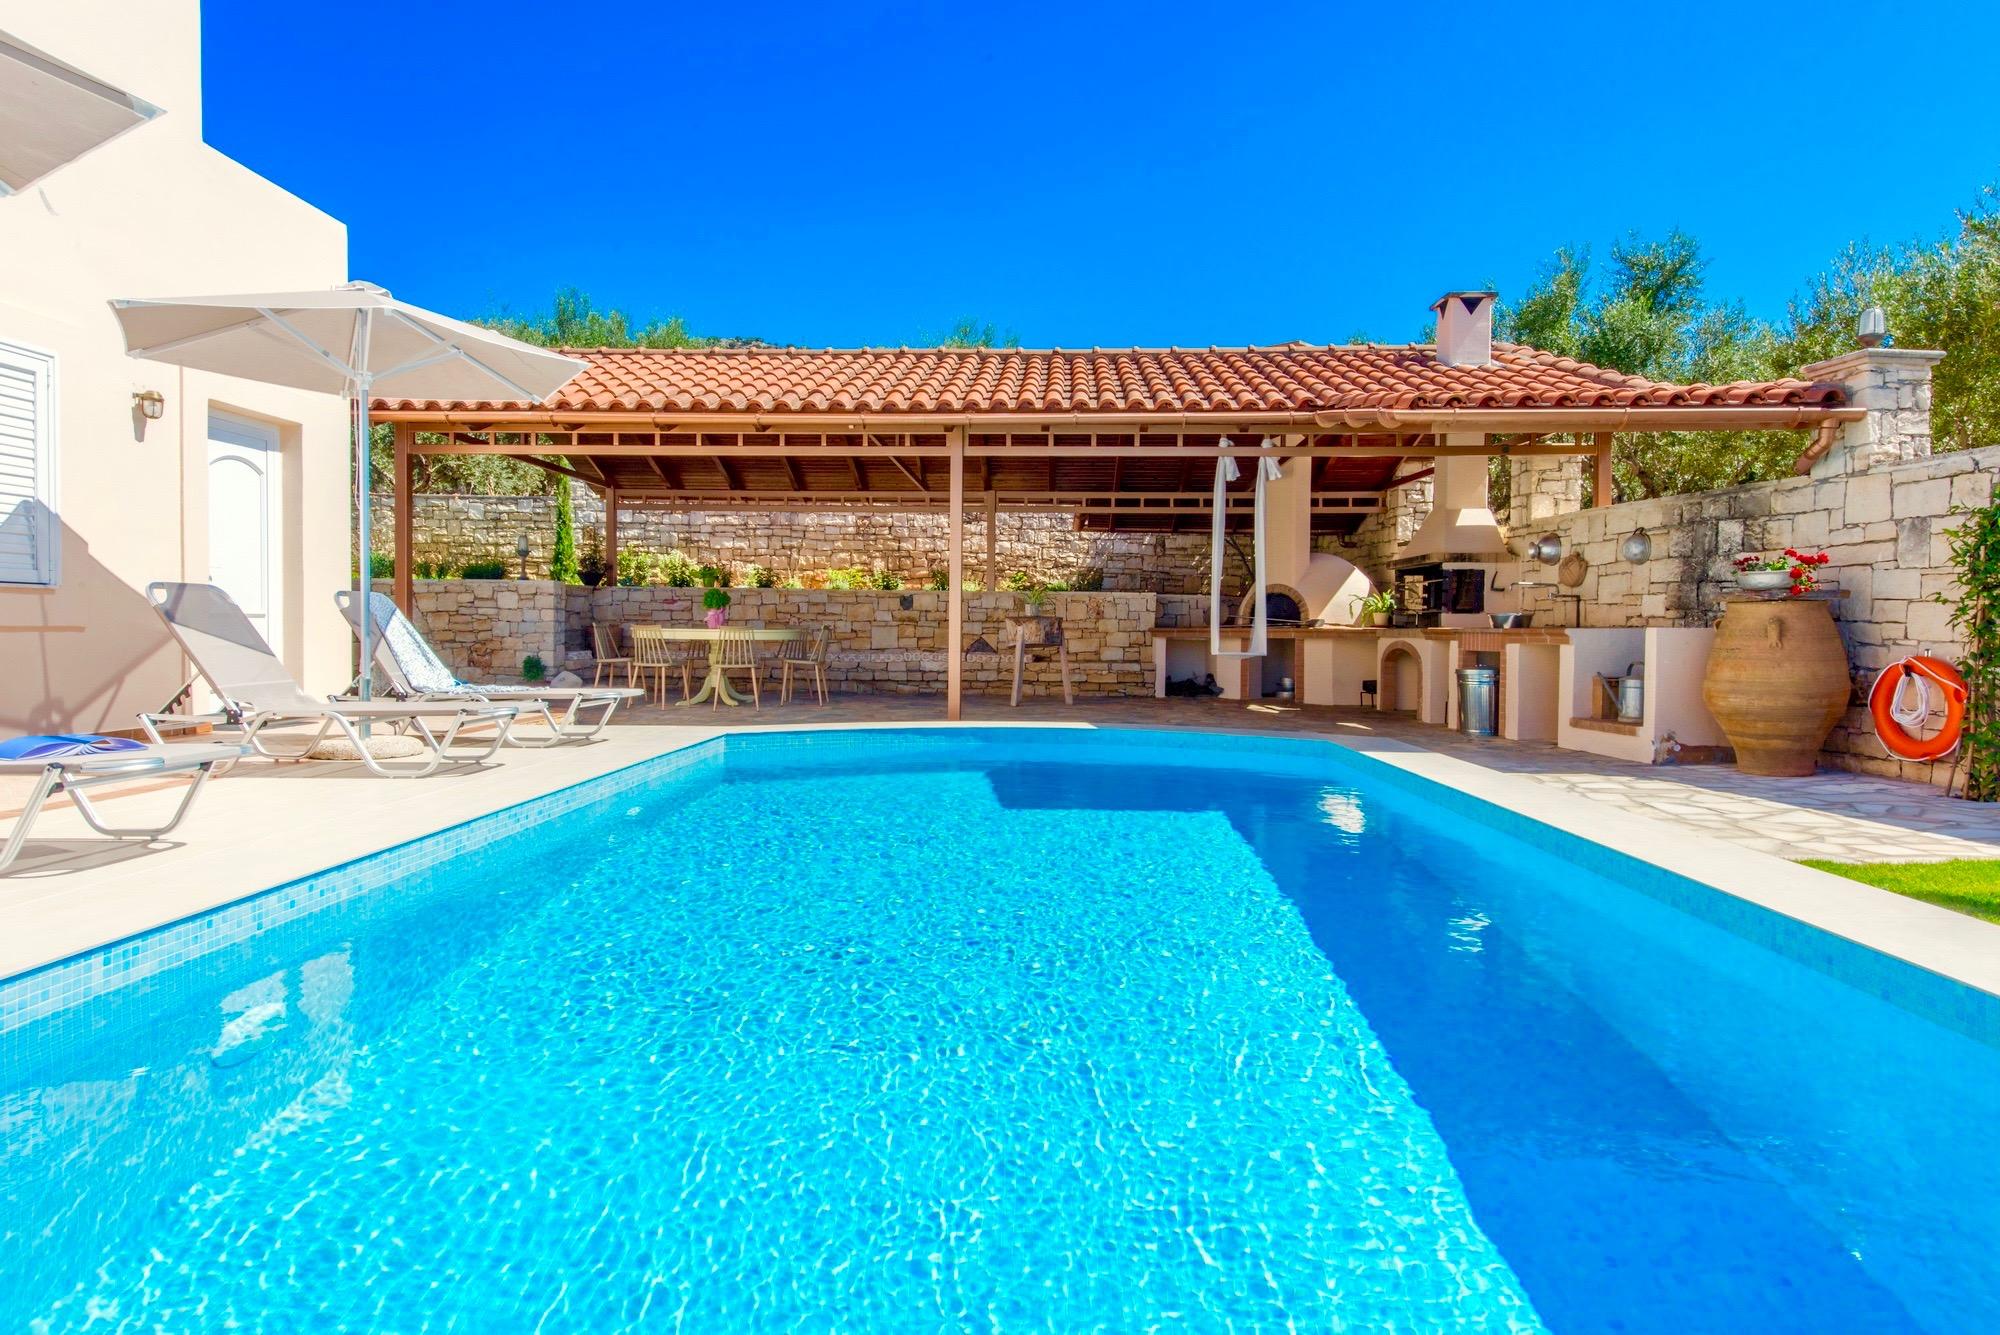 Ferienhaus Luxury Villa Korini with private swimming pool (2470495), Roumeli, Kreta Nordküste, Kreta, Griechenland, Bild 11